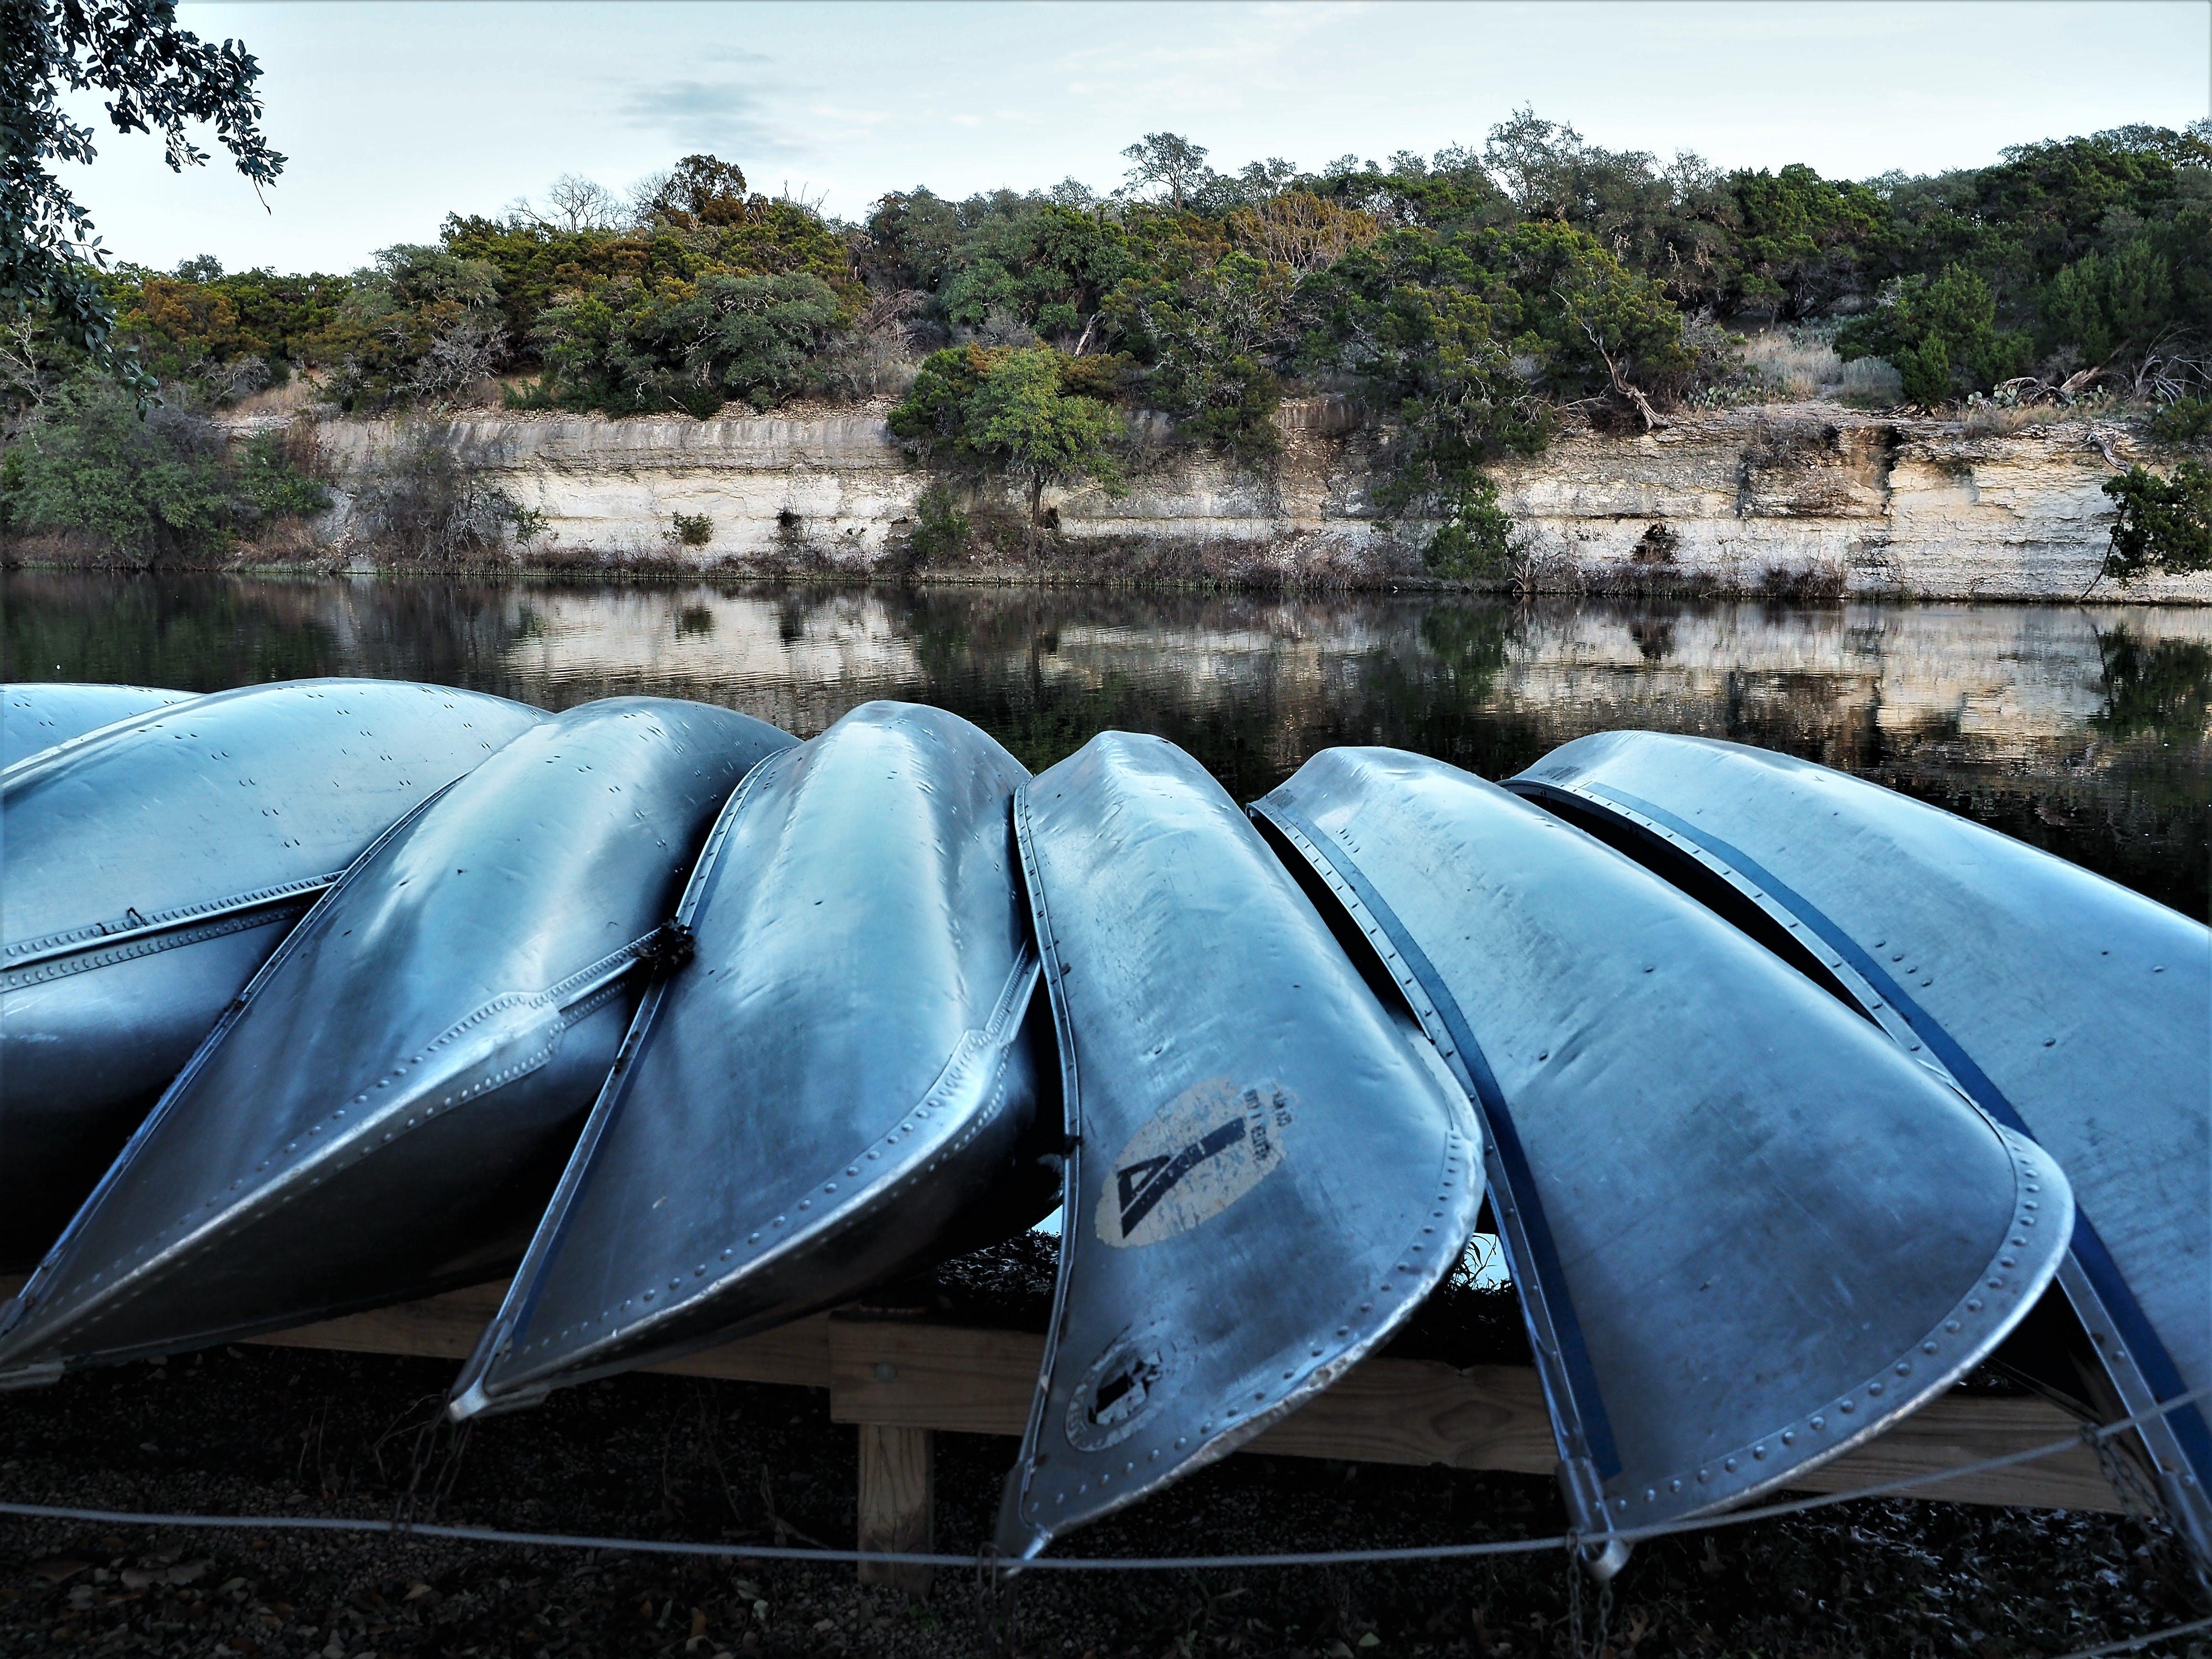 Free stock photo of canoe, lake, water